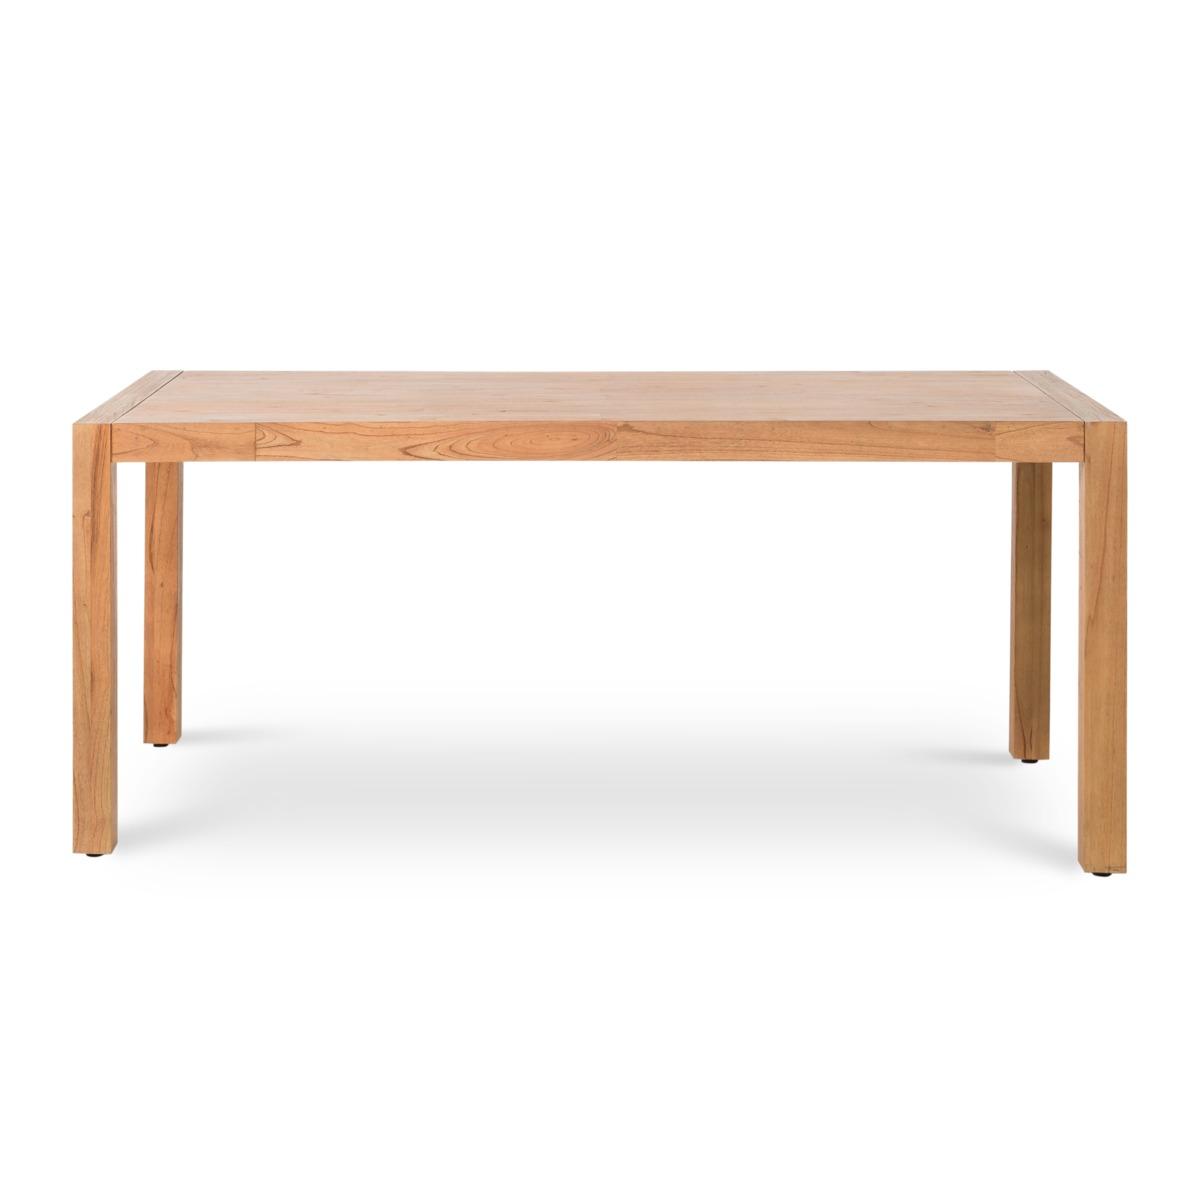 Alexander Dining Table, 210cm